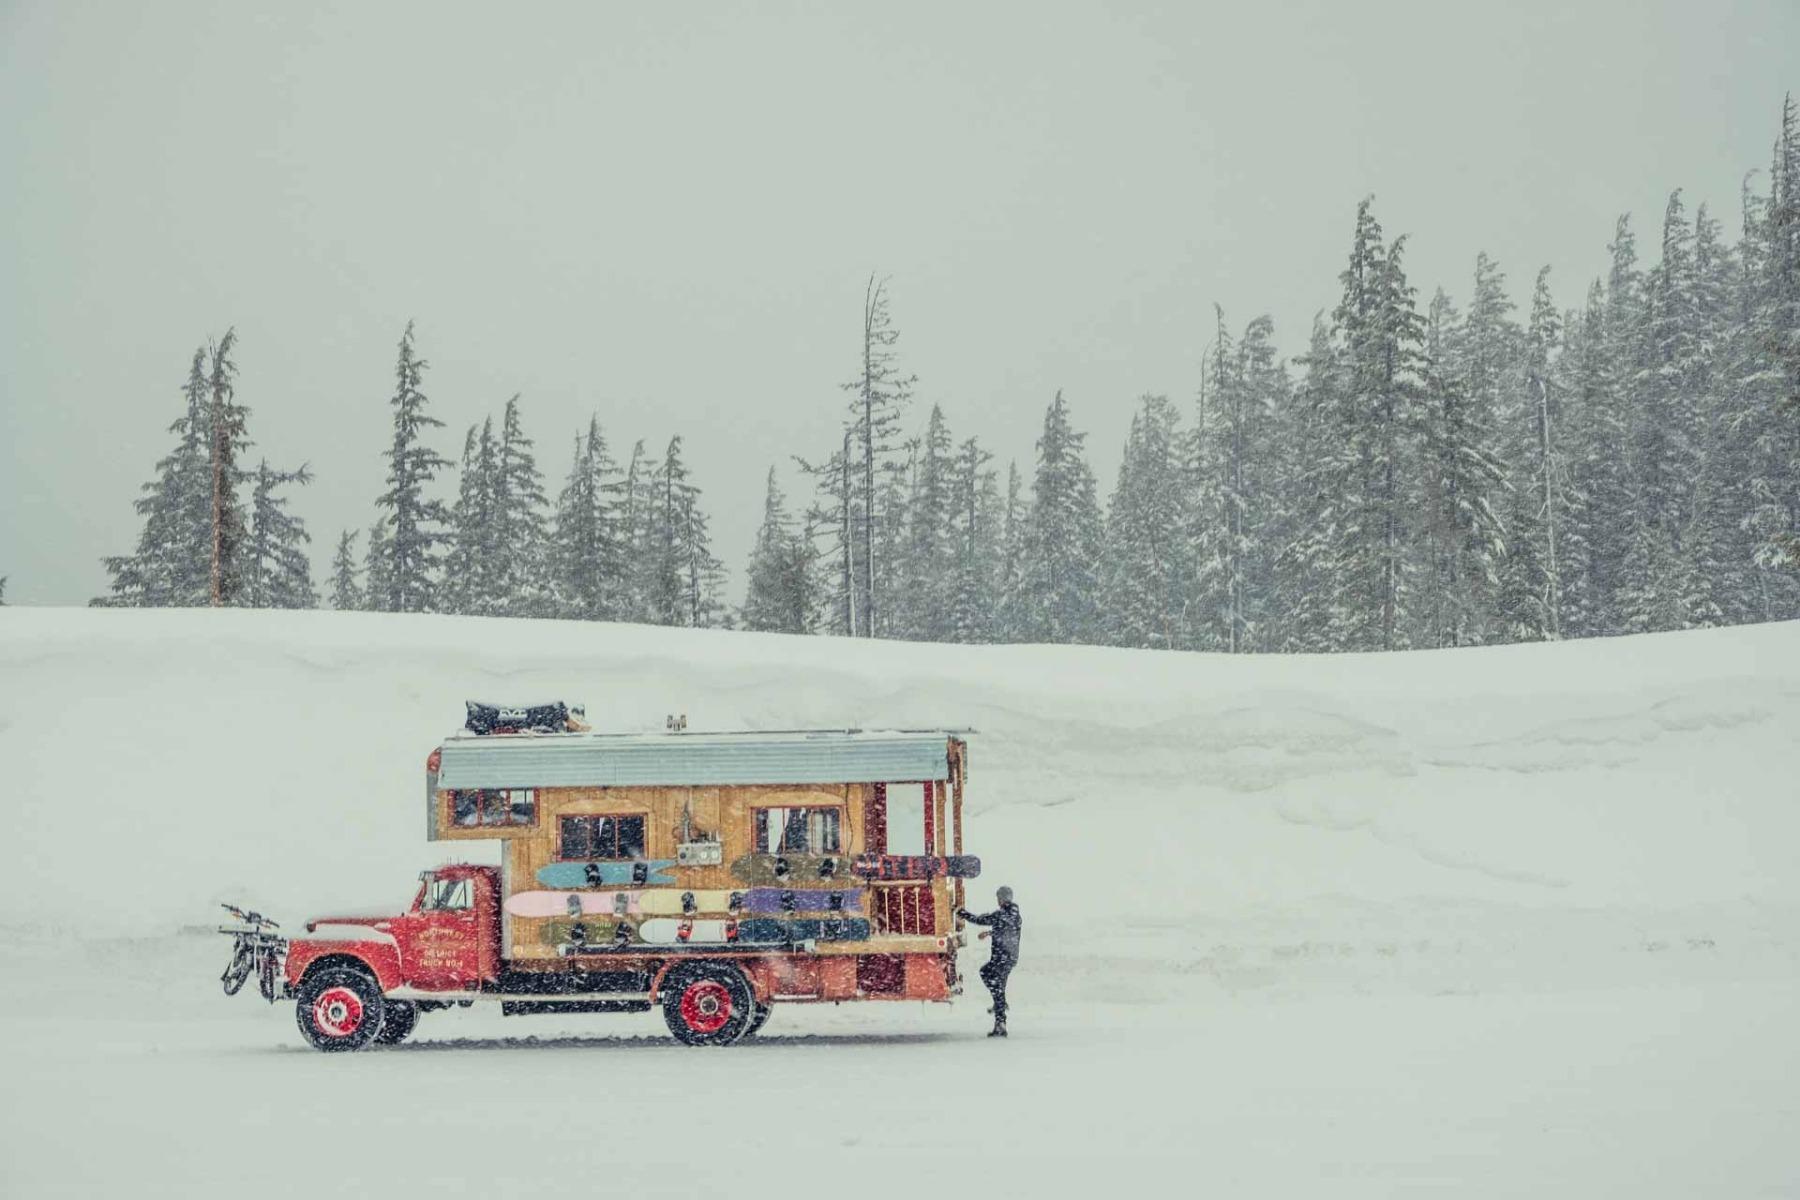 NITRO Snowboards THE FIRETRUCK 2.0 - Destination Alaska